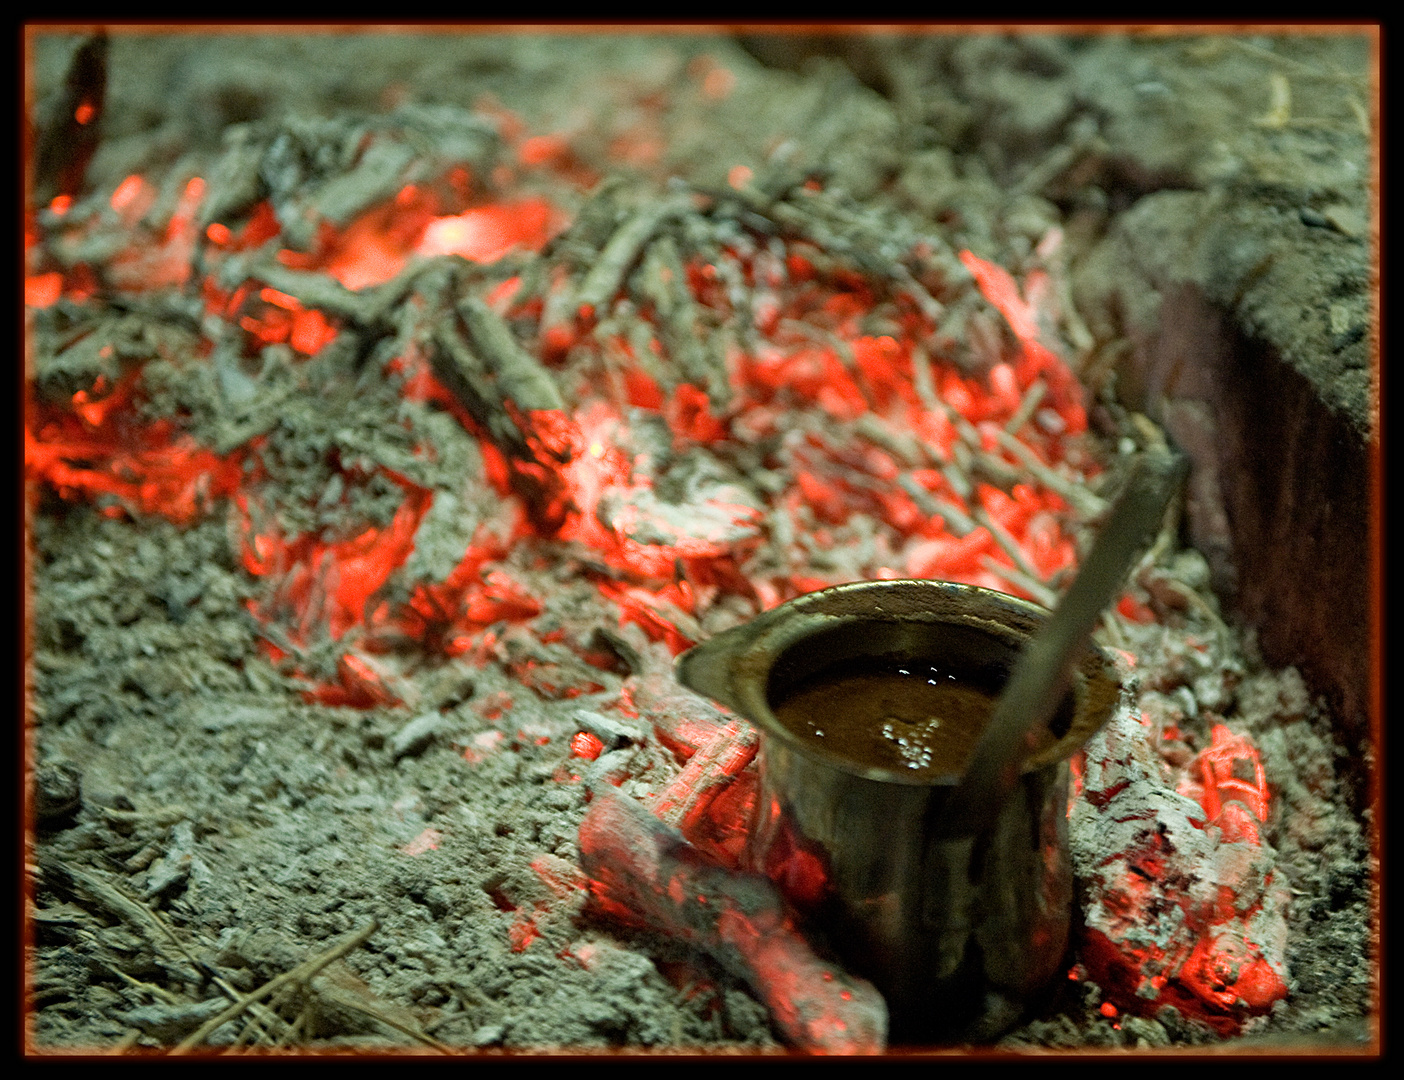 Bedouin caffe